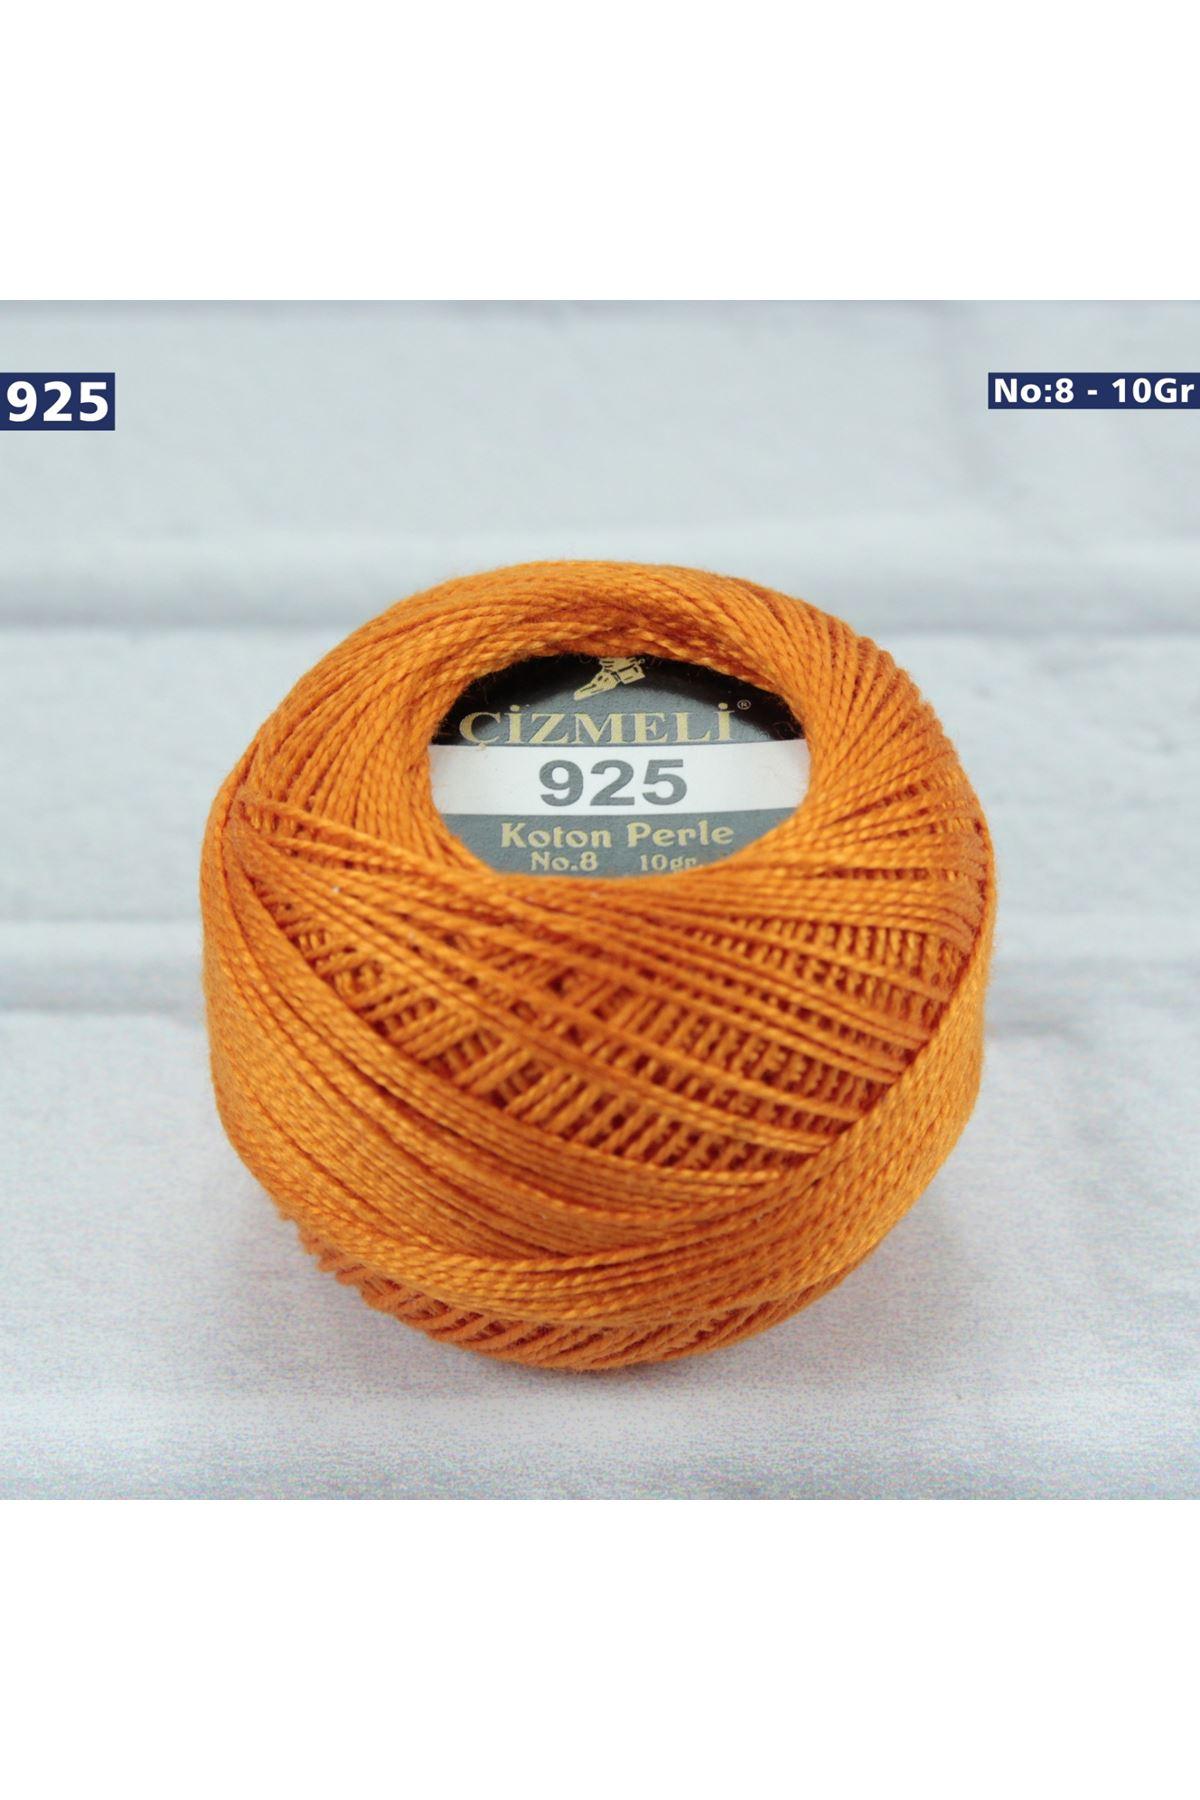 Çizmeli Cotton Perle Nakış İpliği No: 925